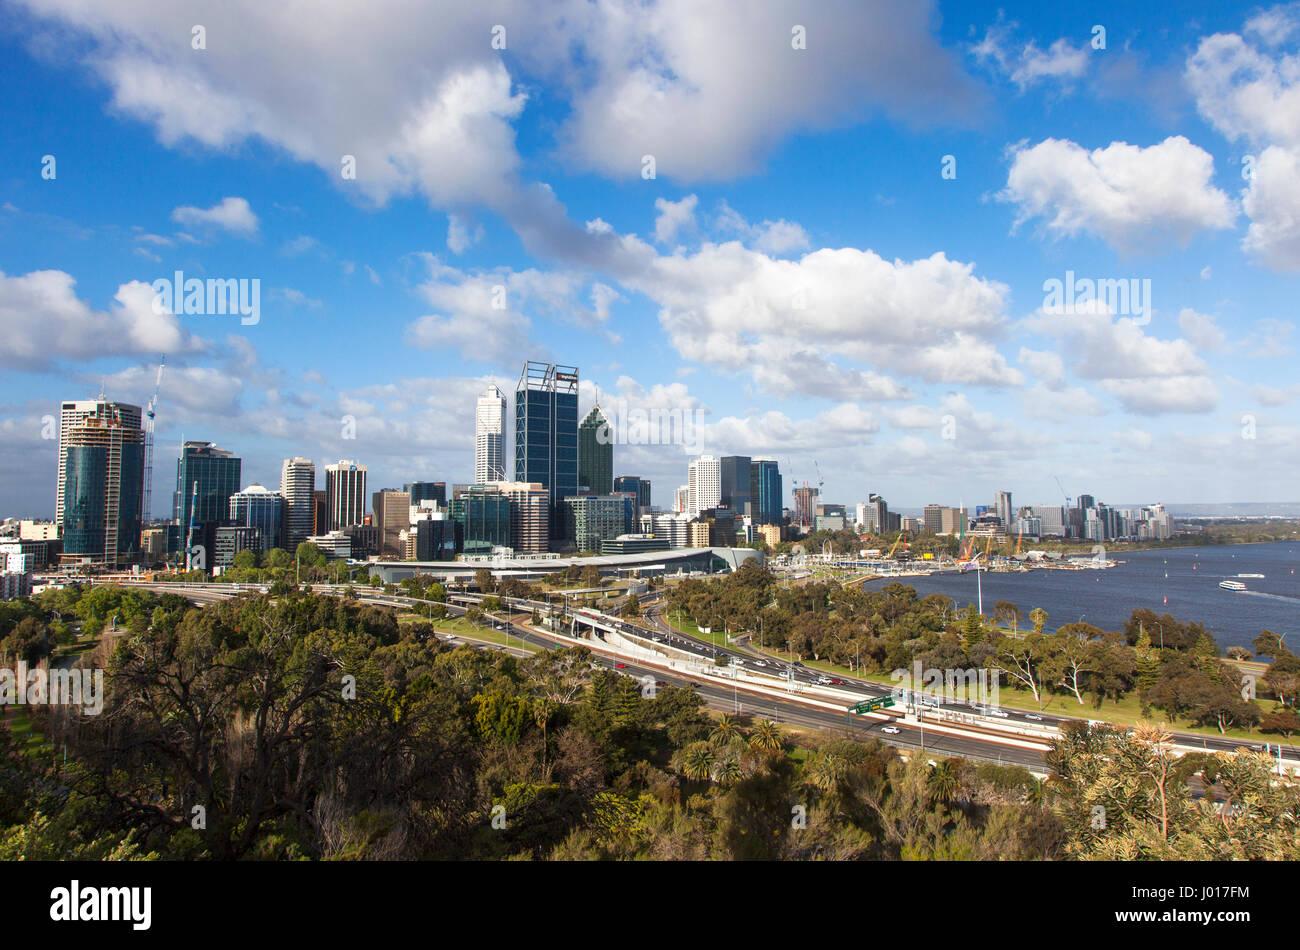 The City of Perth, Australia Stock Photo